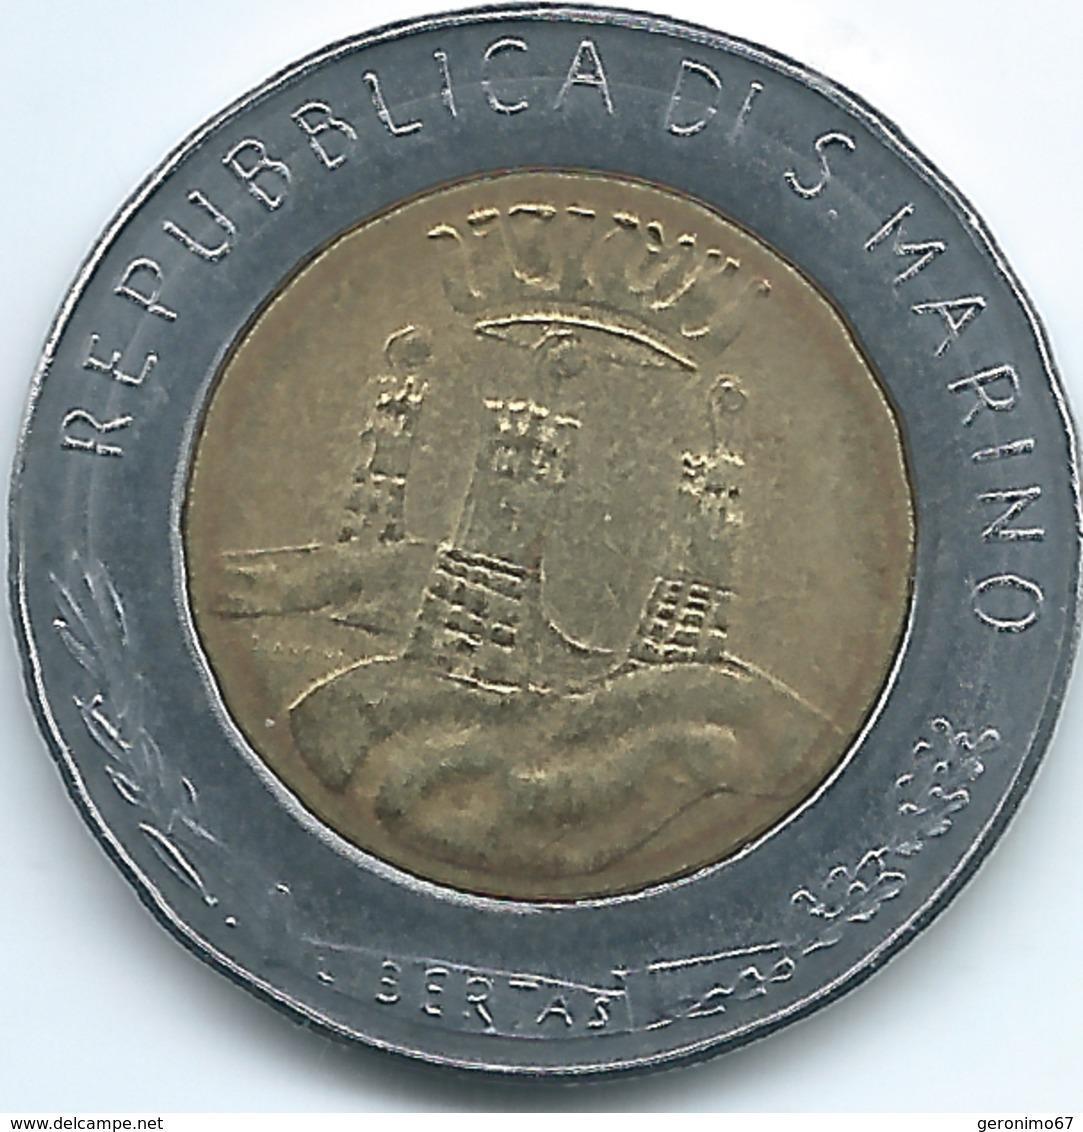 San Marino - 1982 - 500 Lire - KM140 - San Marino